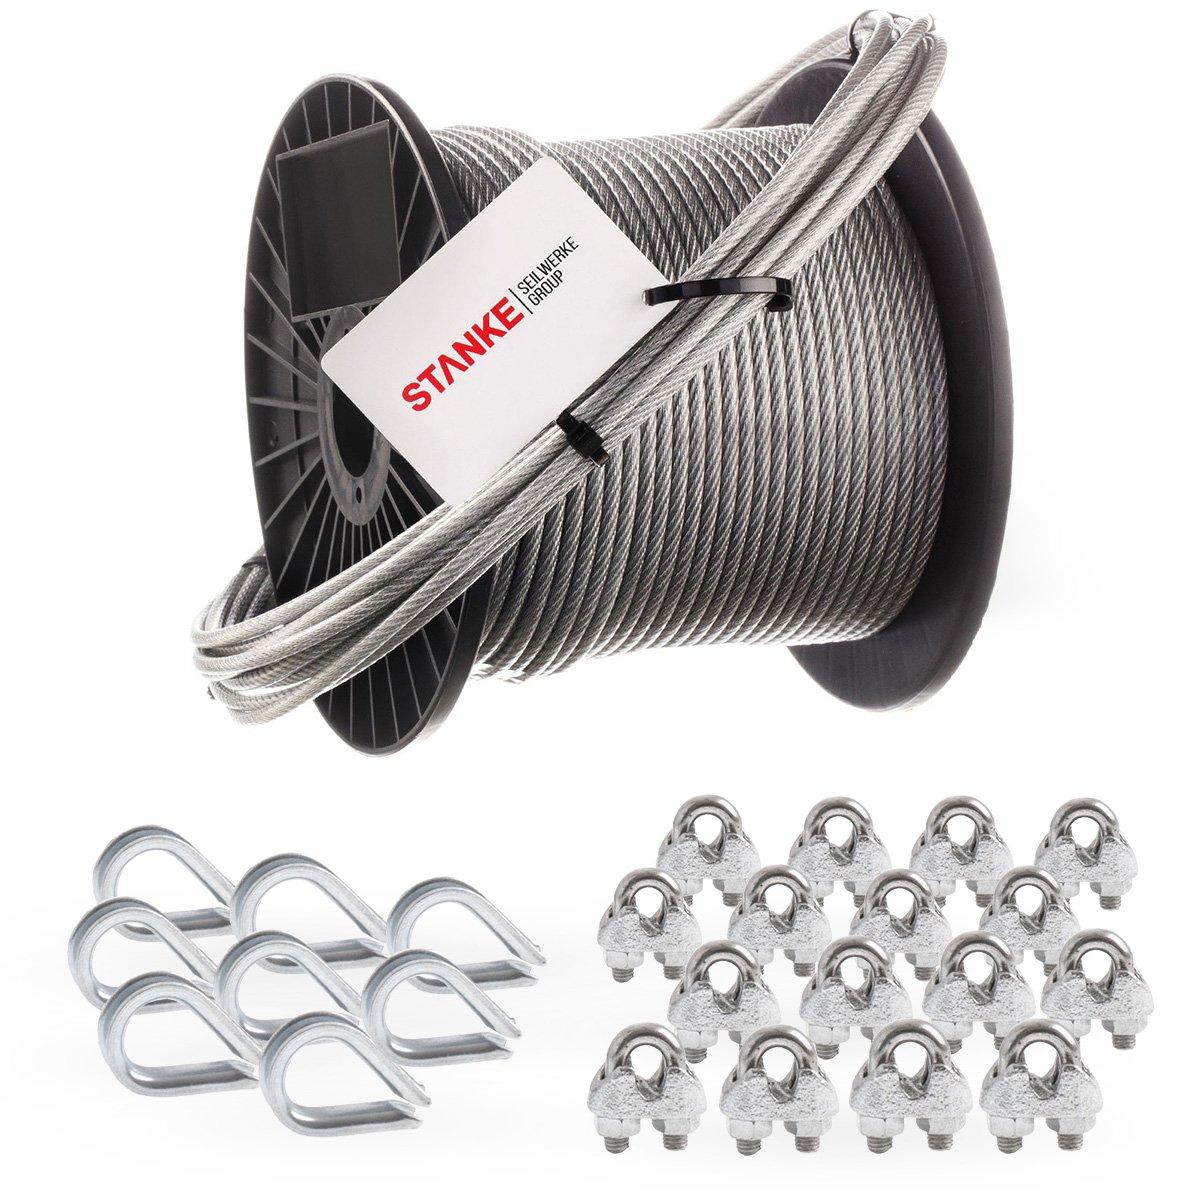 Seilwerk STANKE Rankhilfe PVC Drahtseil ummantelt verzinkt 10m Stahlseil 3mm 6x7, 8x Kausche, 16x Bü gelformklemme - SET 3